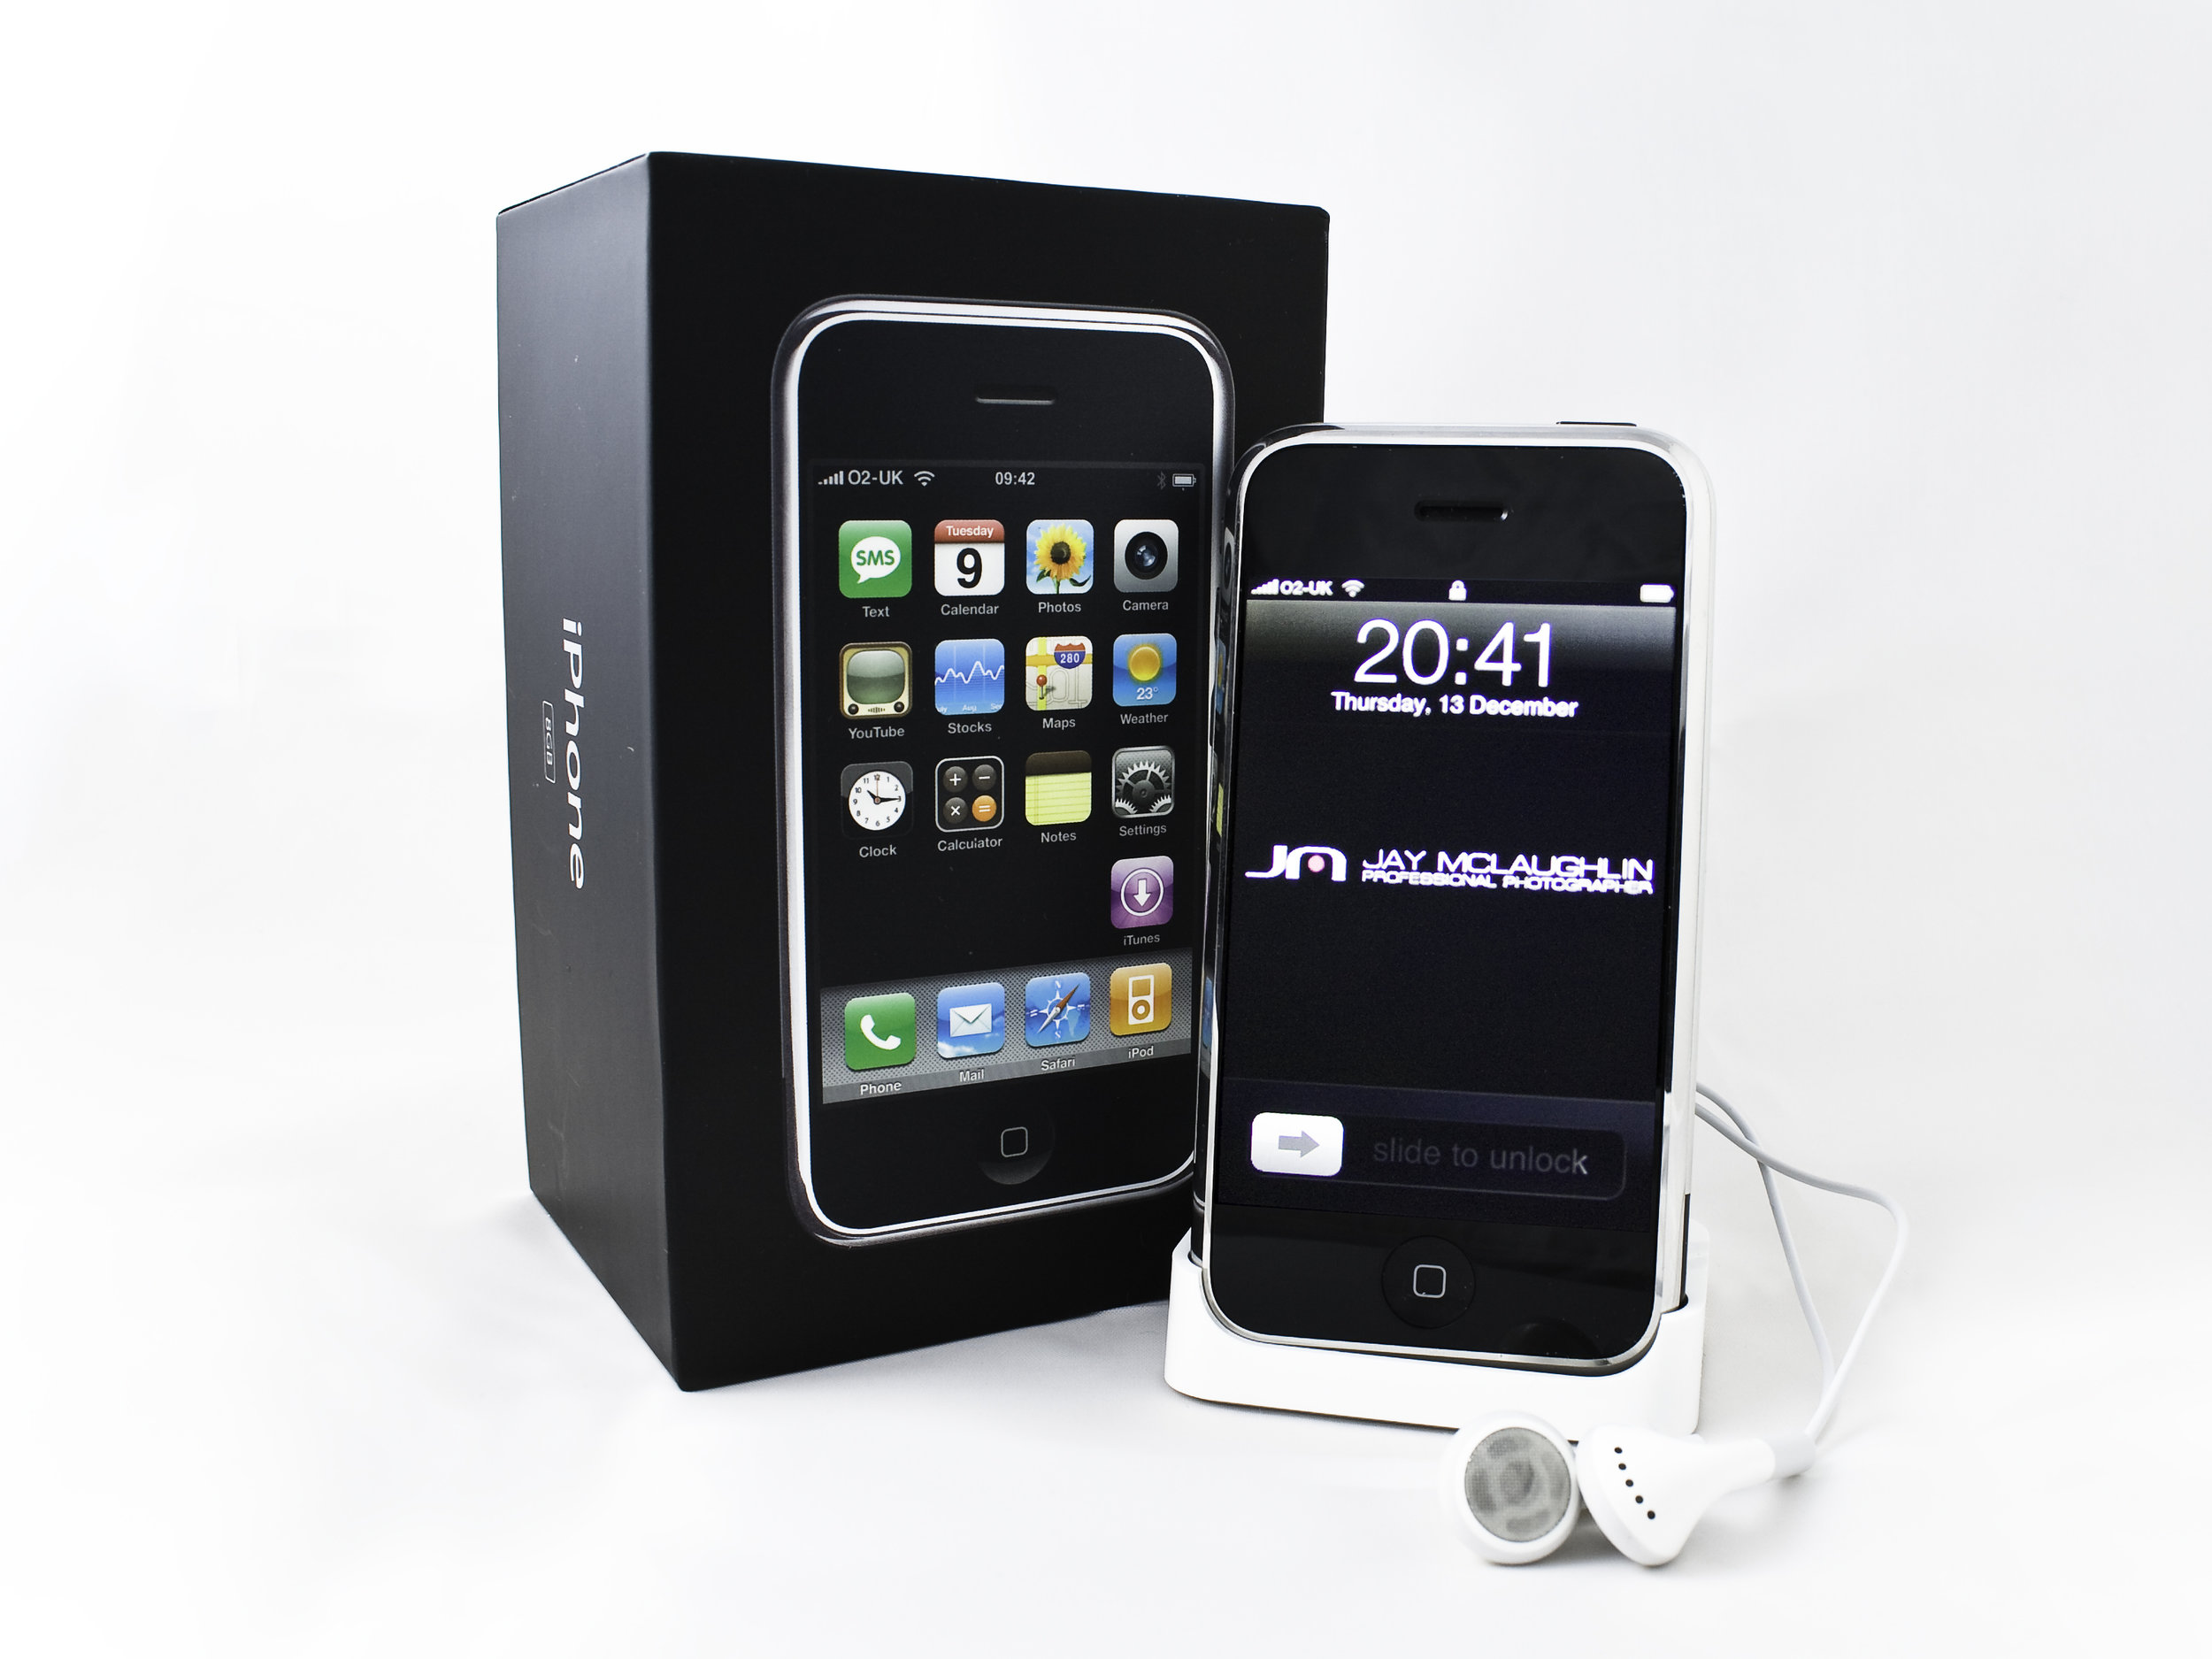 iPhone 2G Original Retro Vintage 8GB Jay McLaughlin